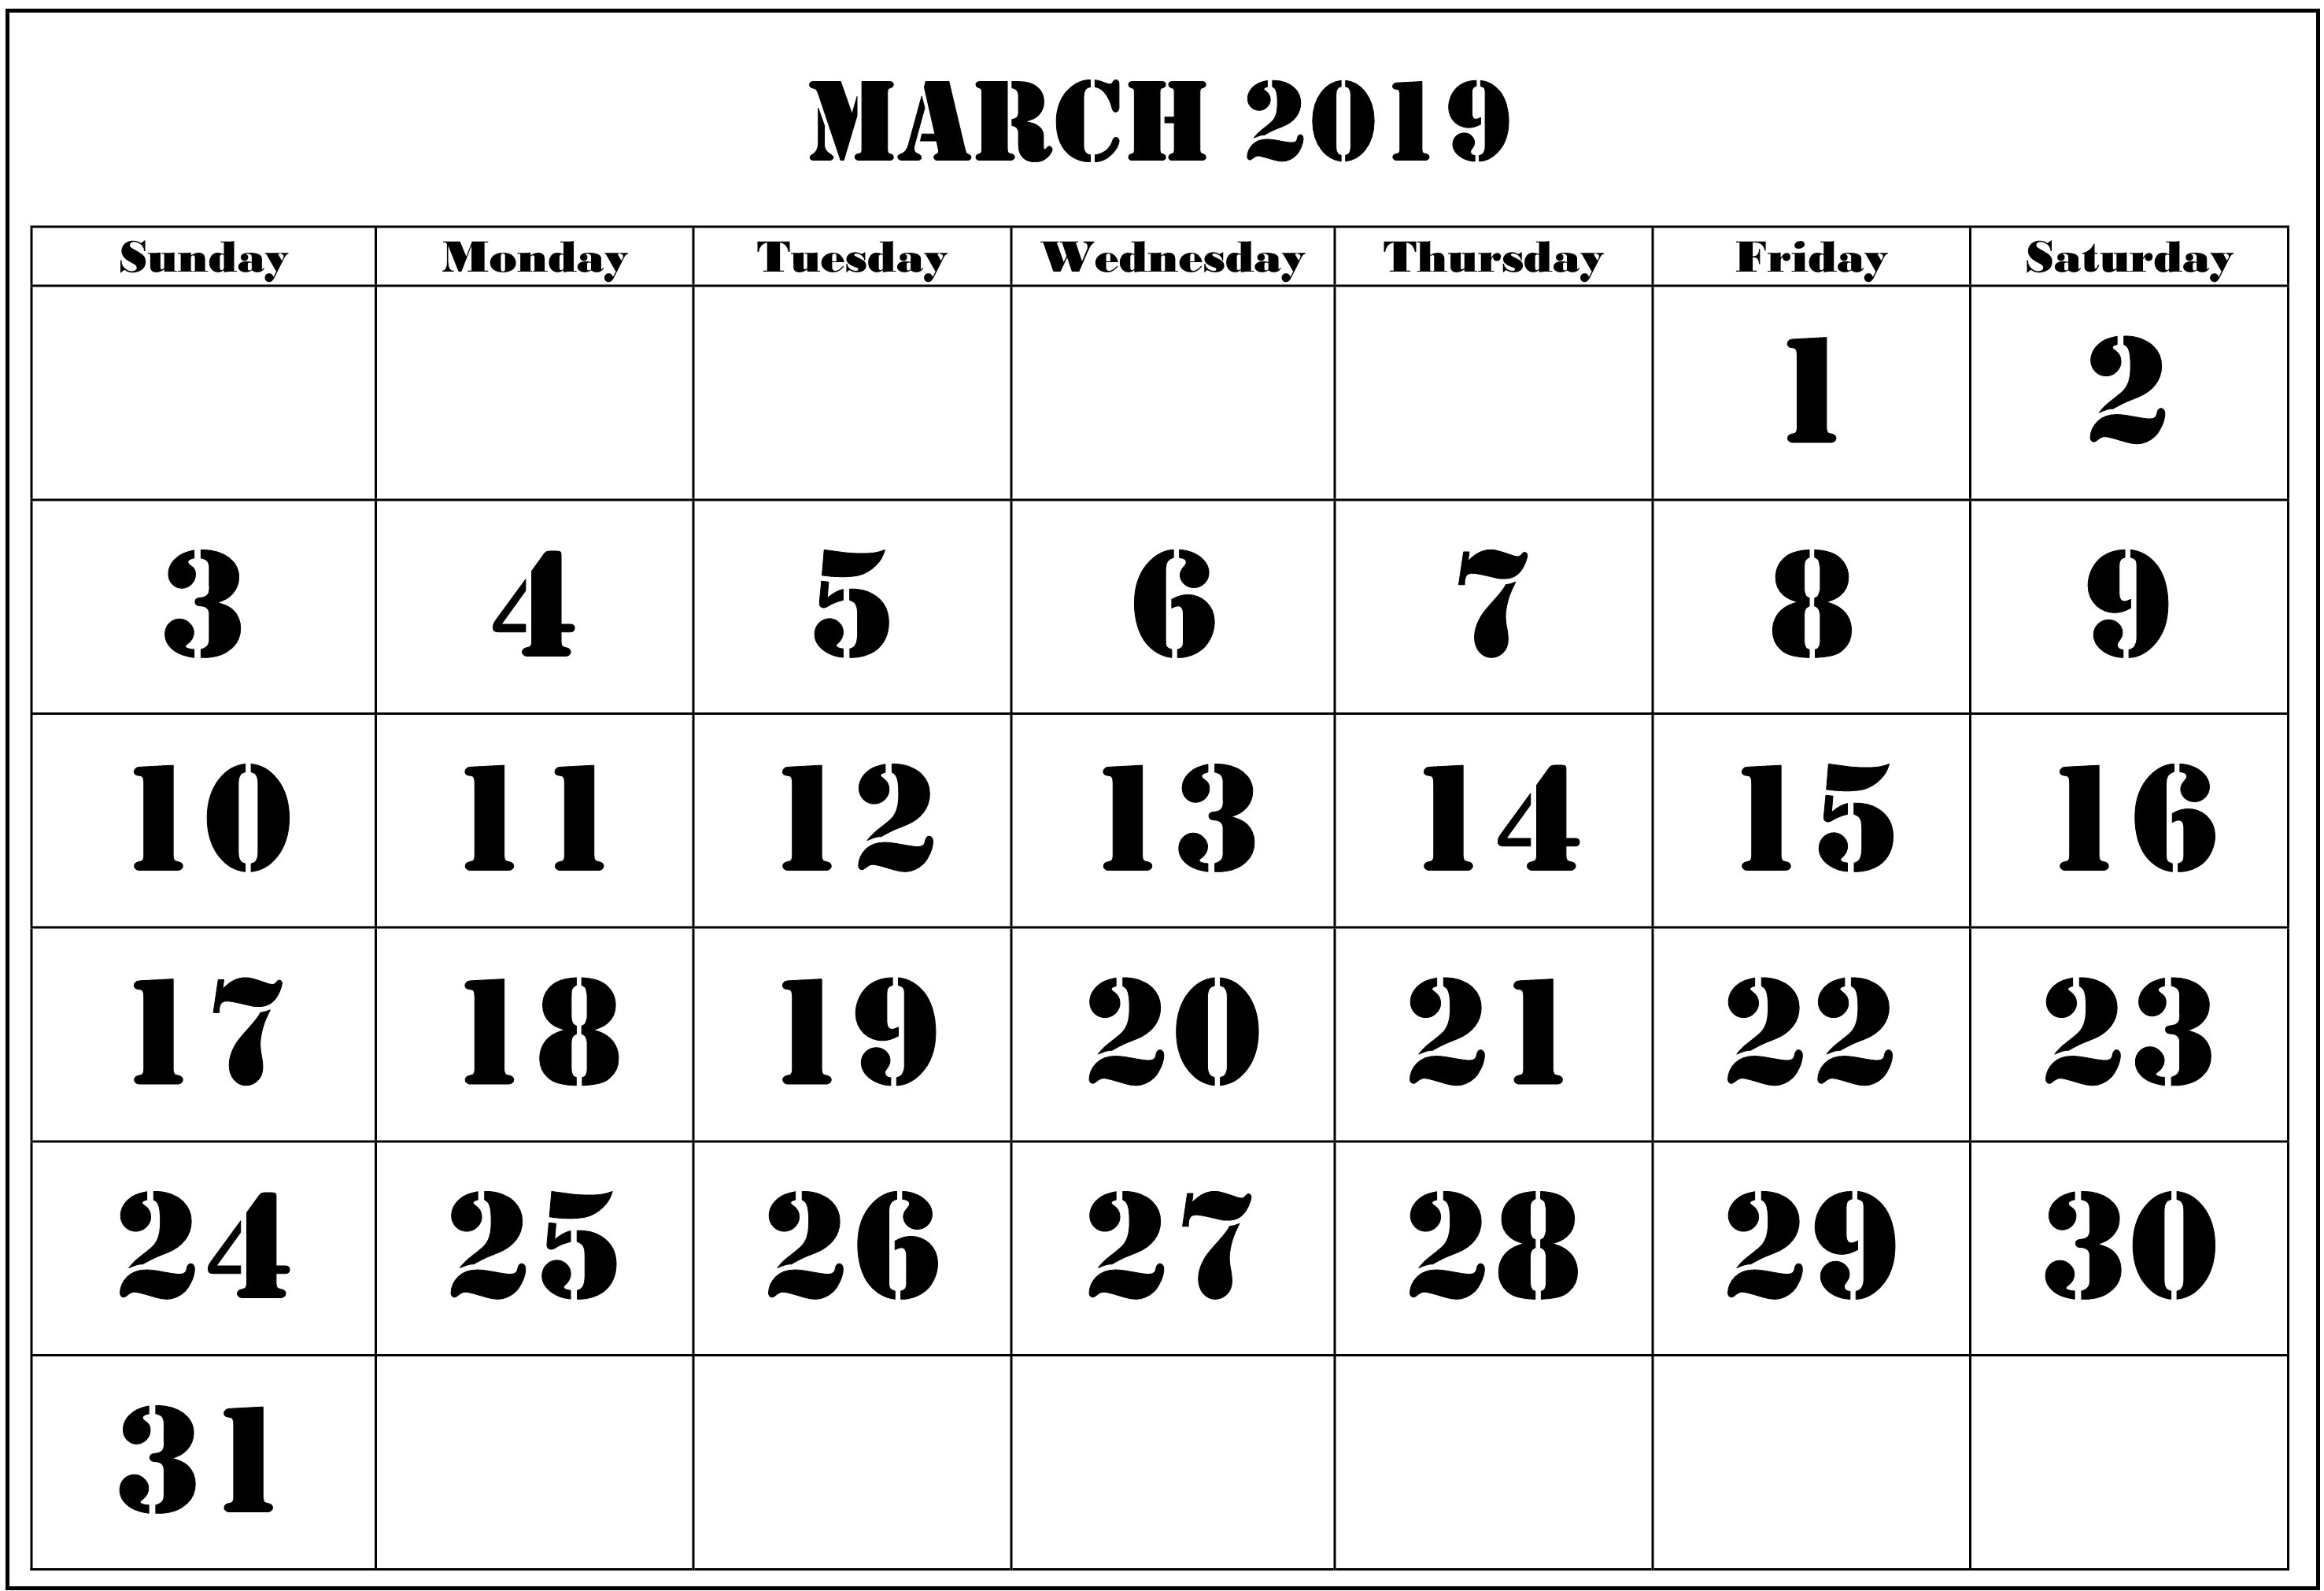 March 2019 Holiday Calendar